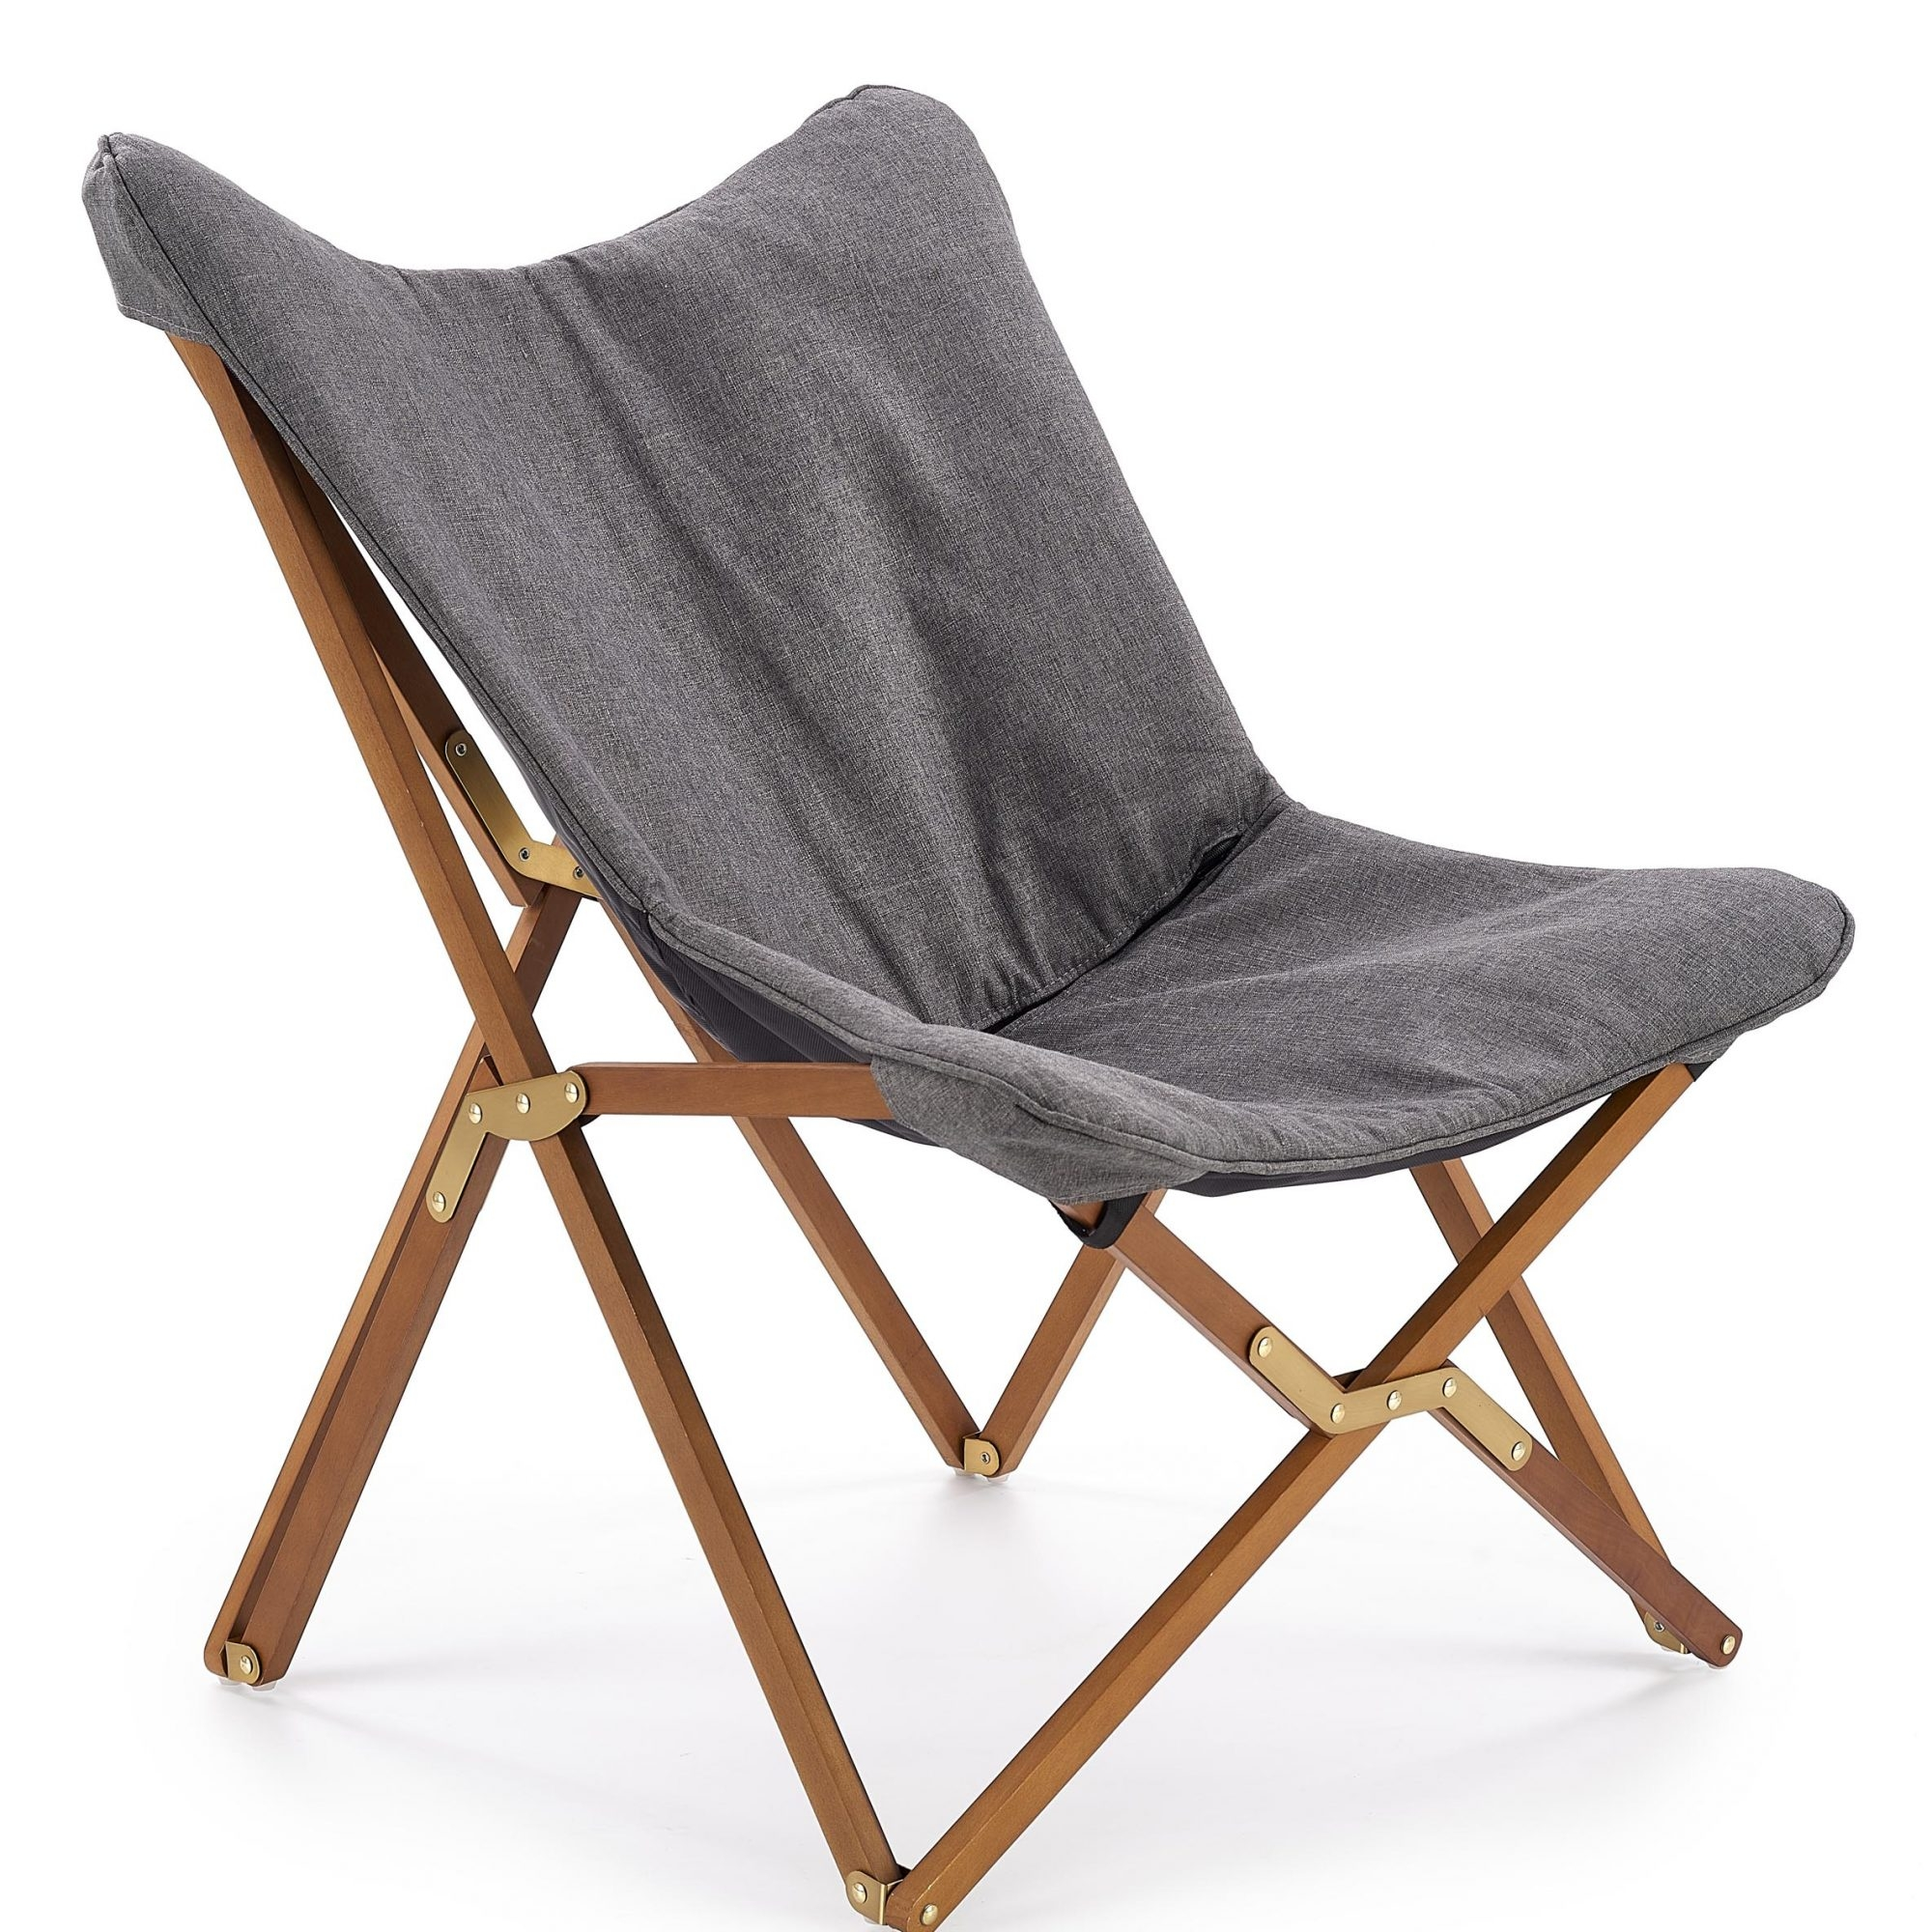 Scaun pliabil din lemn si stofa Volant Grey / Walnut l76xA83xH97 cm